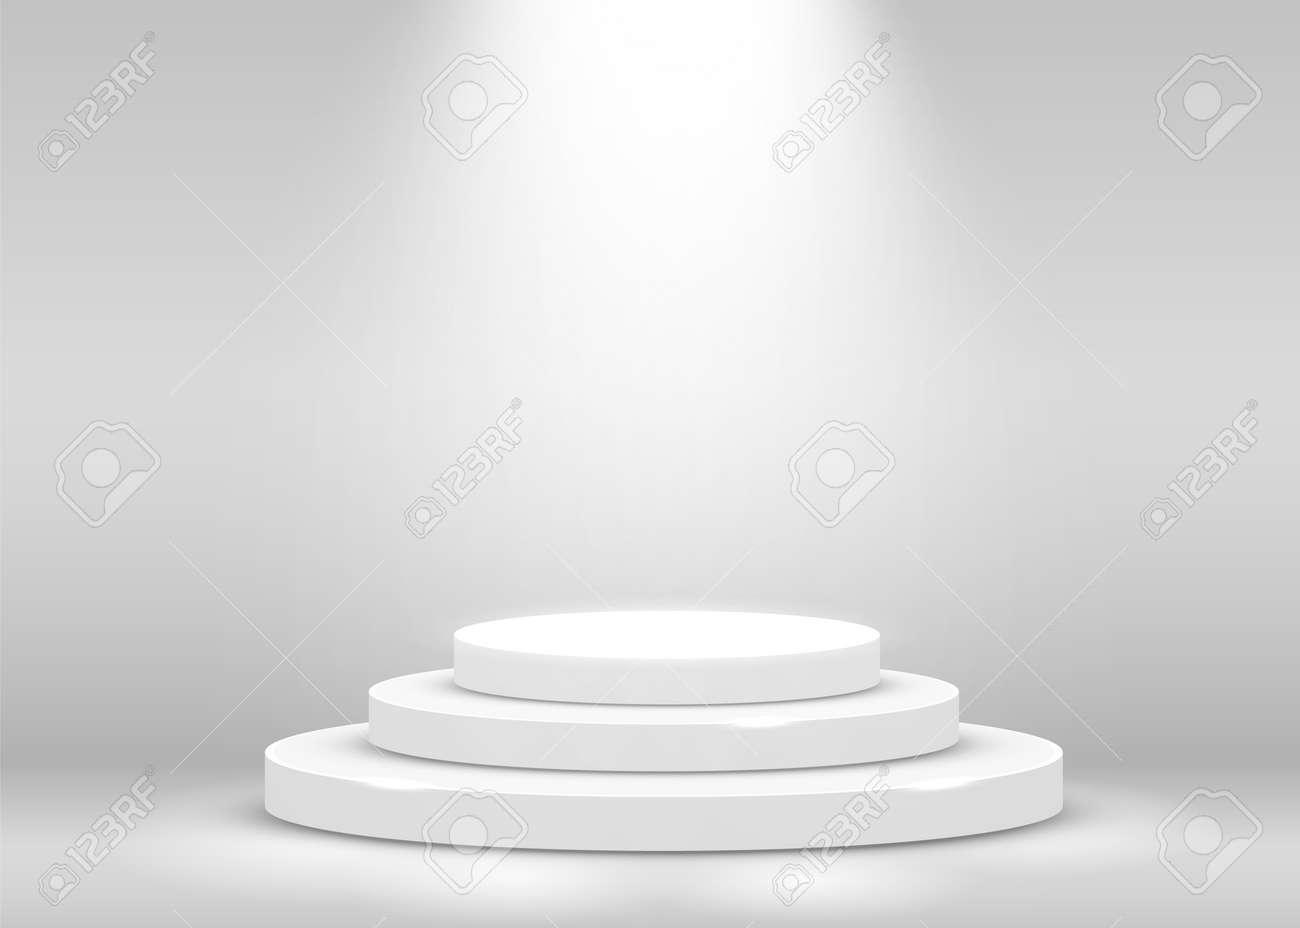 Stage Podium Scene for Award Ceremony illuminated with spotlight. Award ceremony concept. Stage backdrop. Vector illustration - 133421796